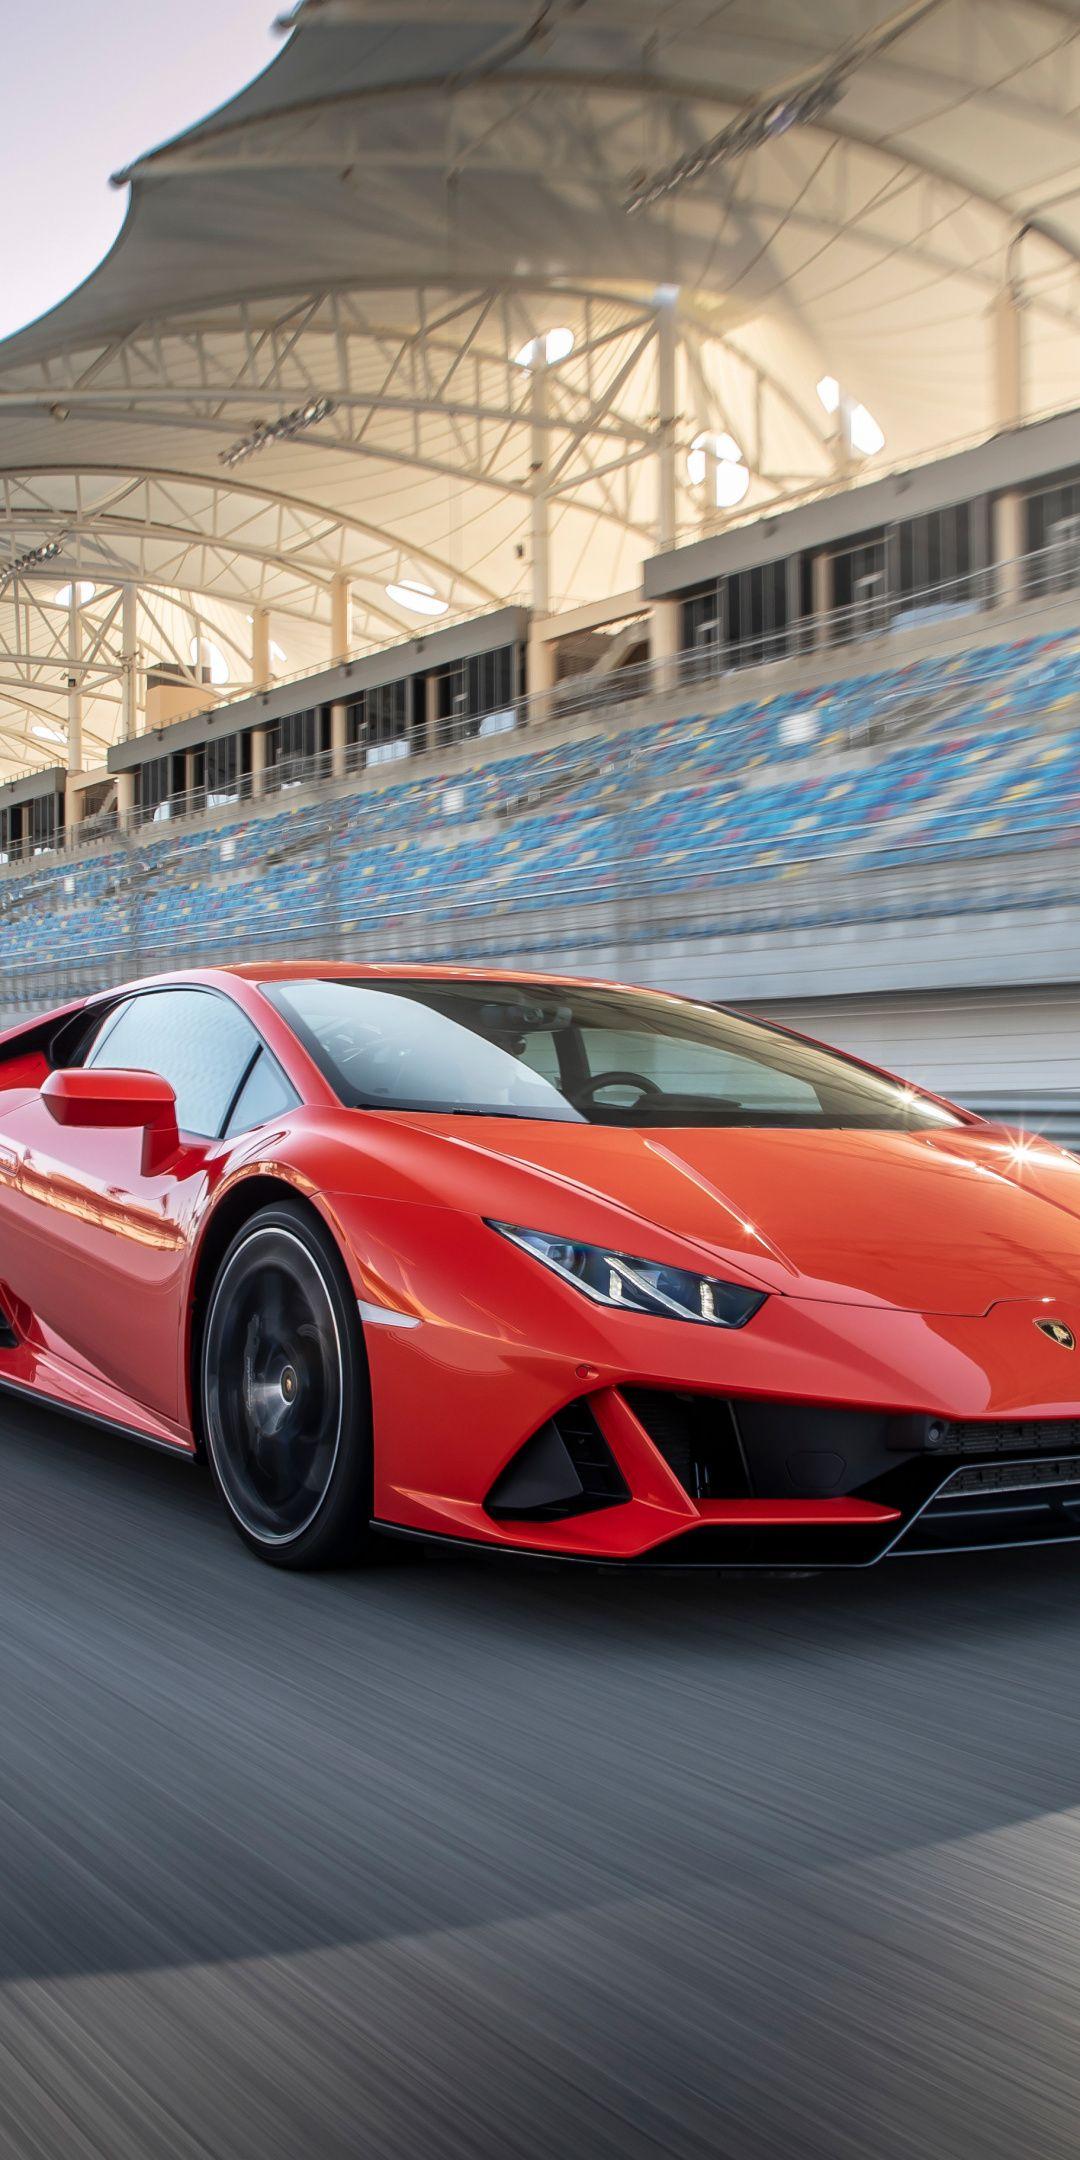 2019 Lamborghini Huracan Evo Red Sports Car Front 1080x2160 Wallpaper Red Sports Car Lamborghini Huracan Sports Cars Lamborghini